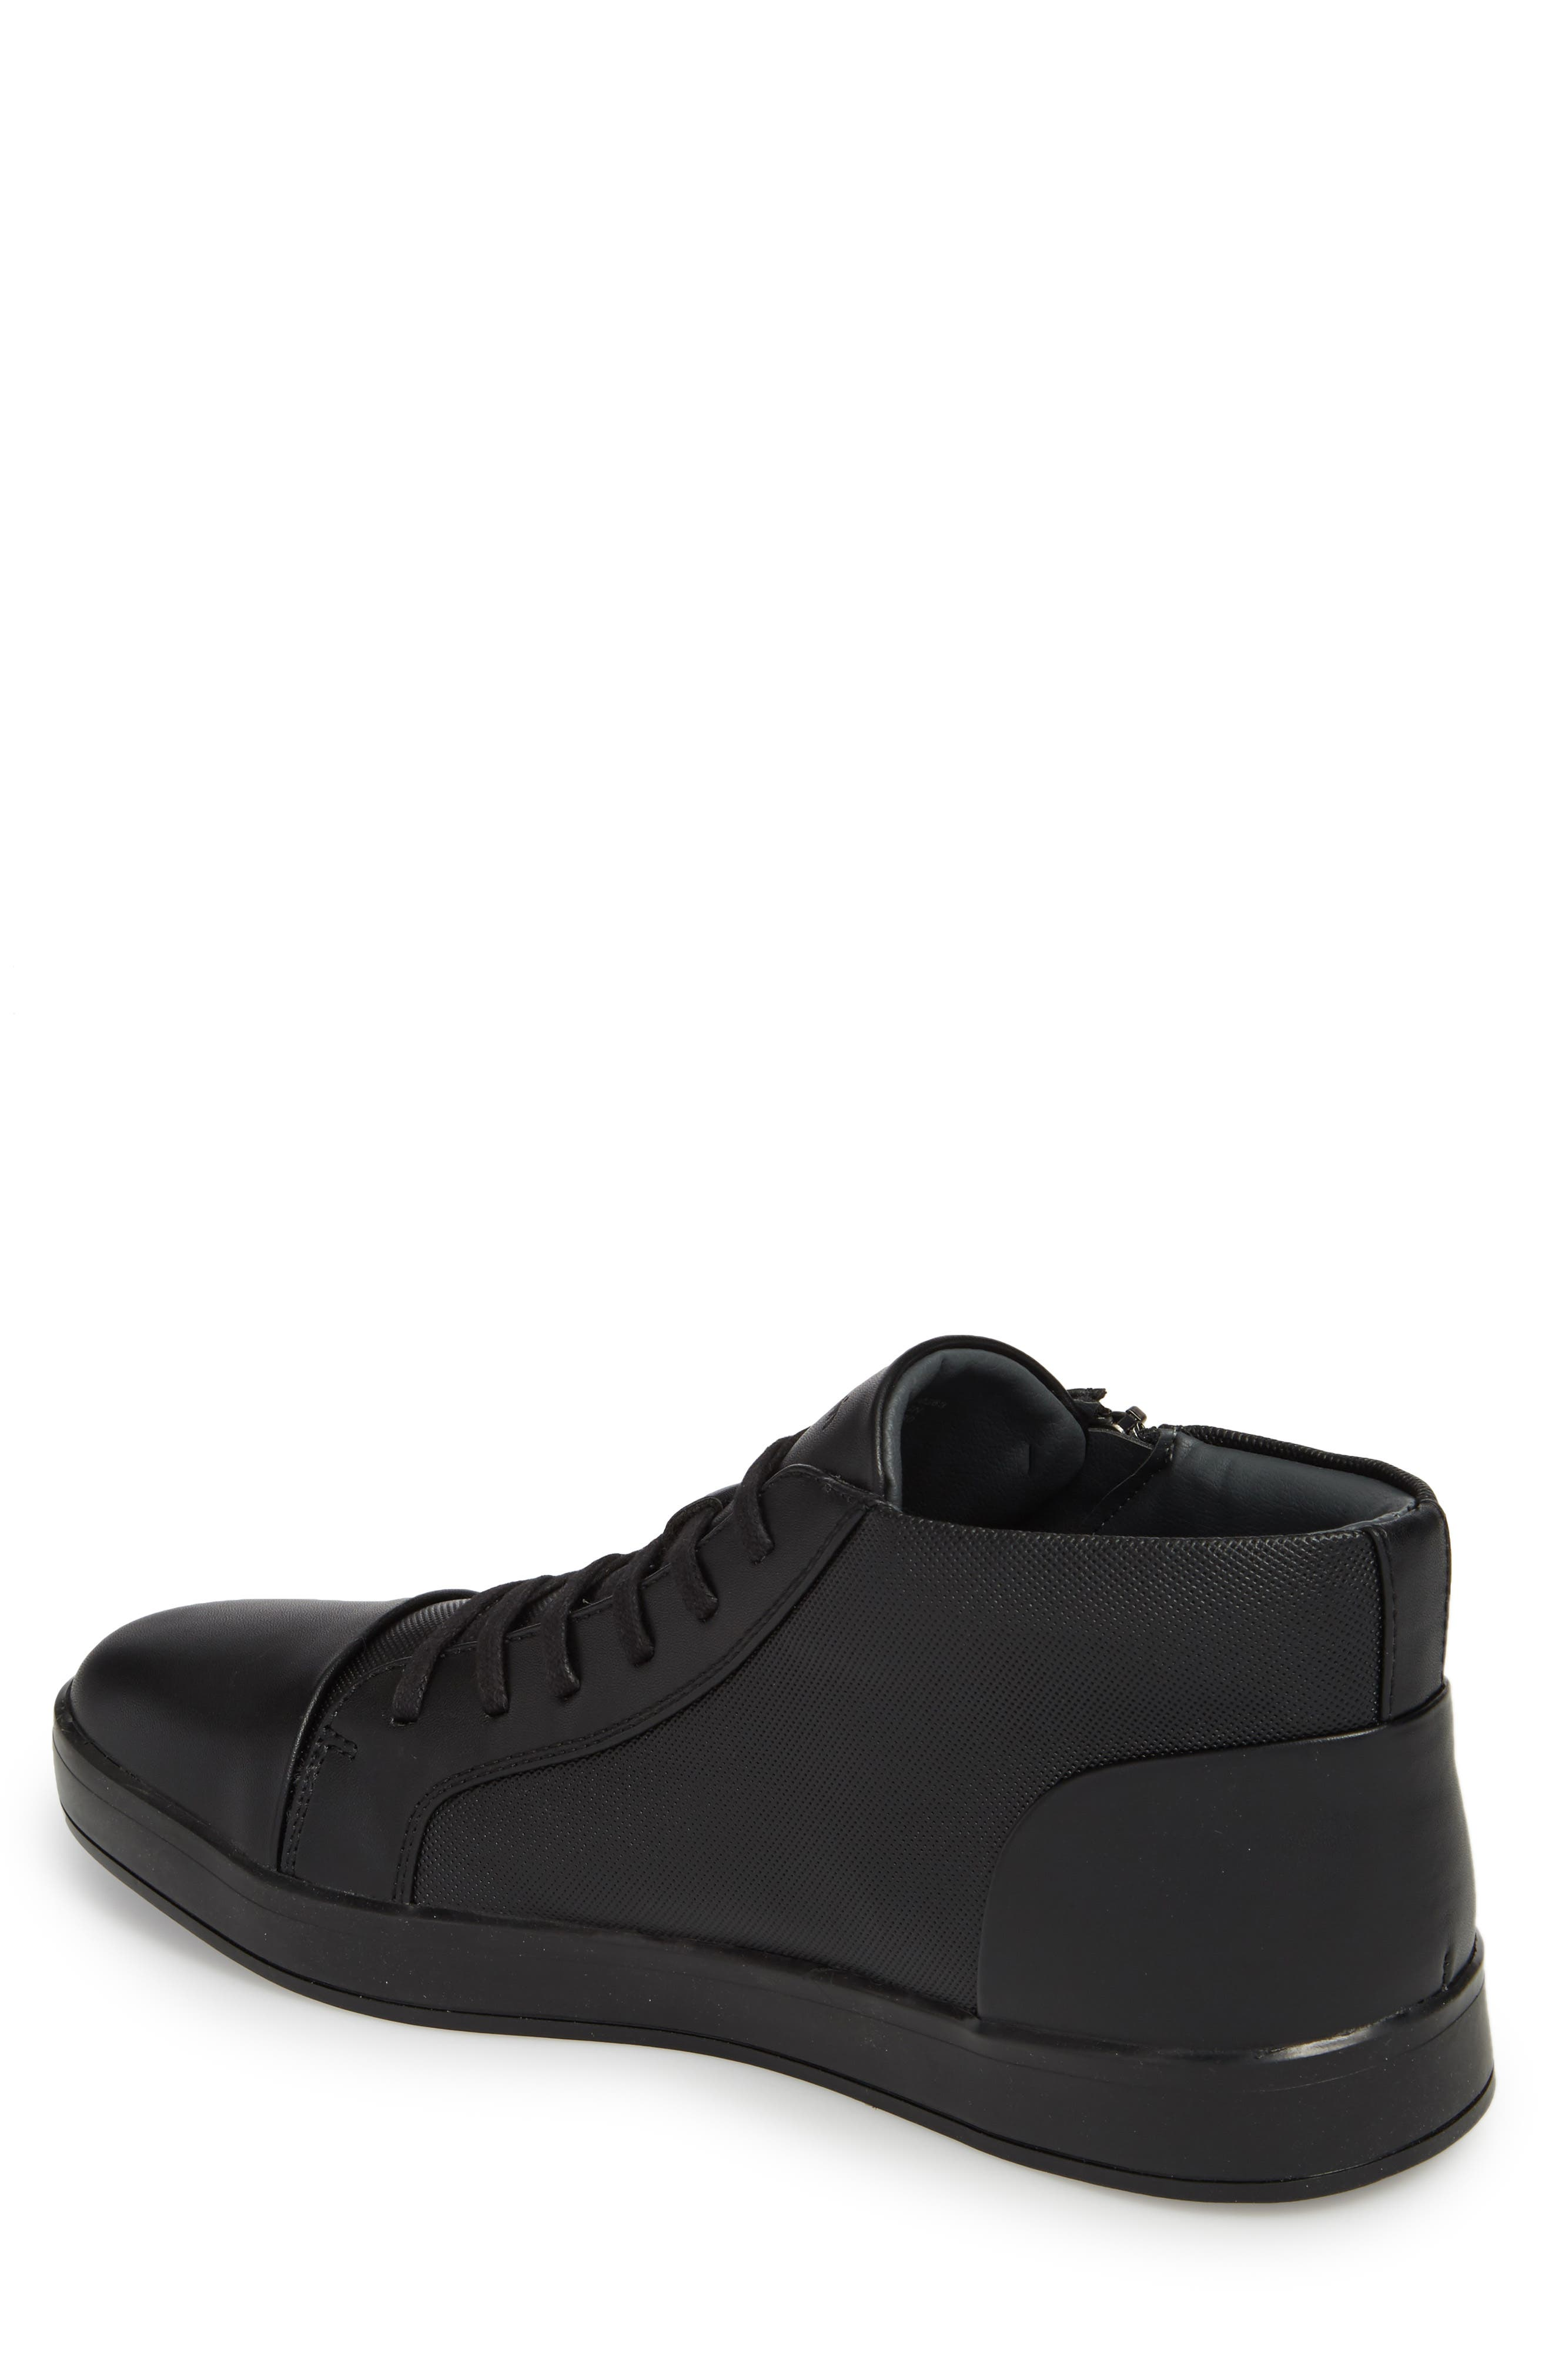 Bozeman High Top Sneaker,                             Alternate thumbnail 2, color,